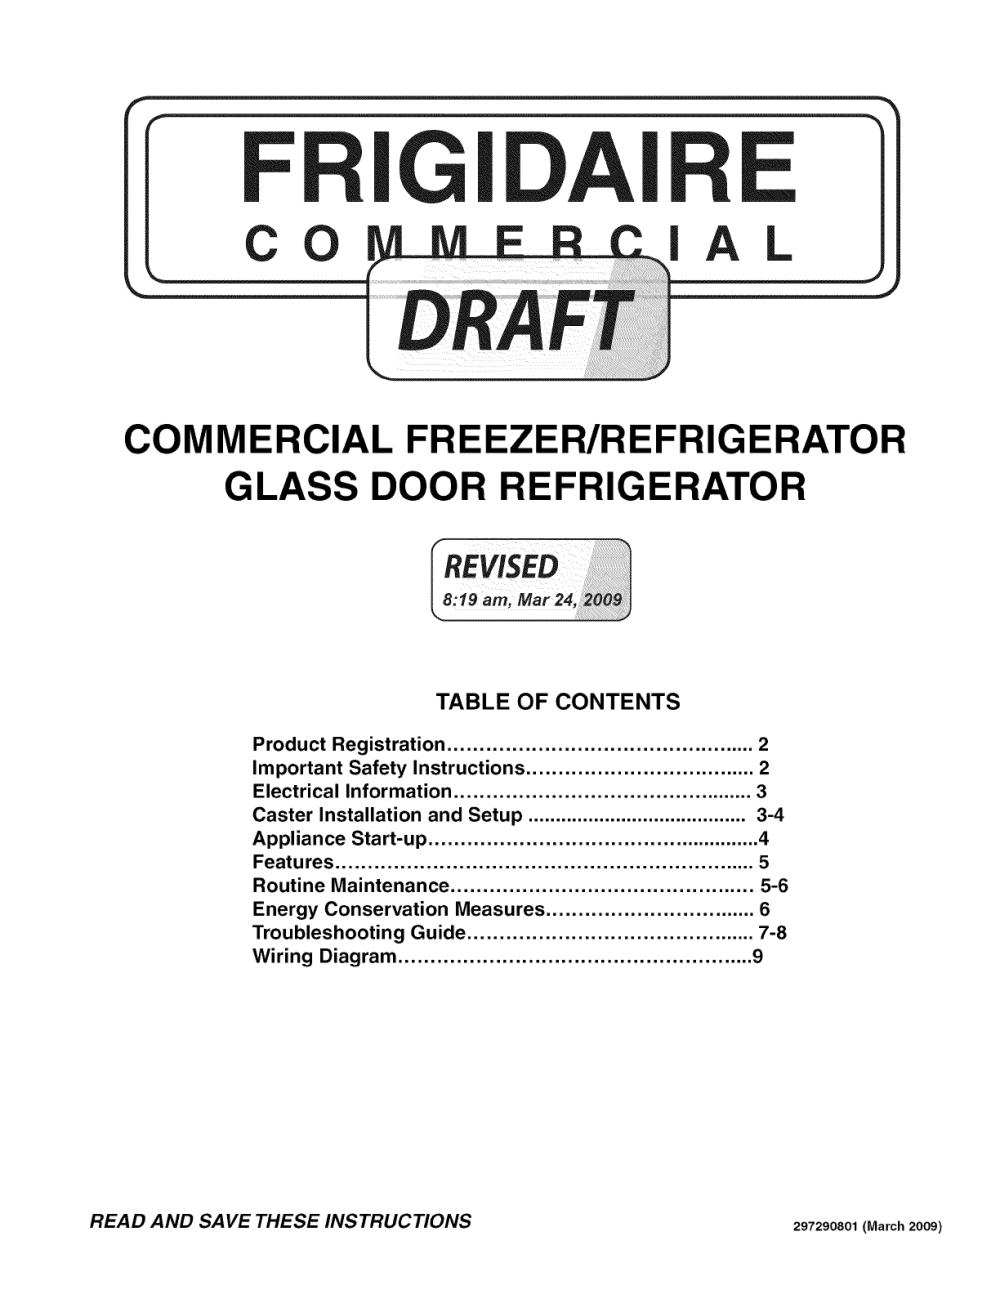 medium resolution of frigidaire fcgm201rfb2 user manual refrigerator freezer manuals and guides l0911500